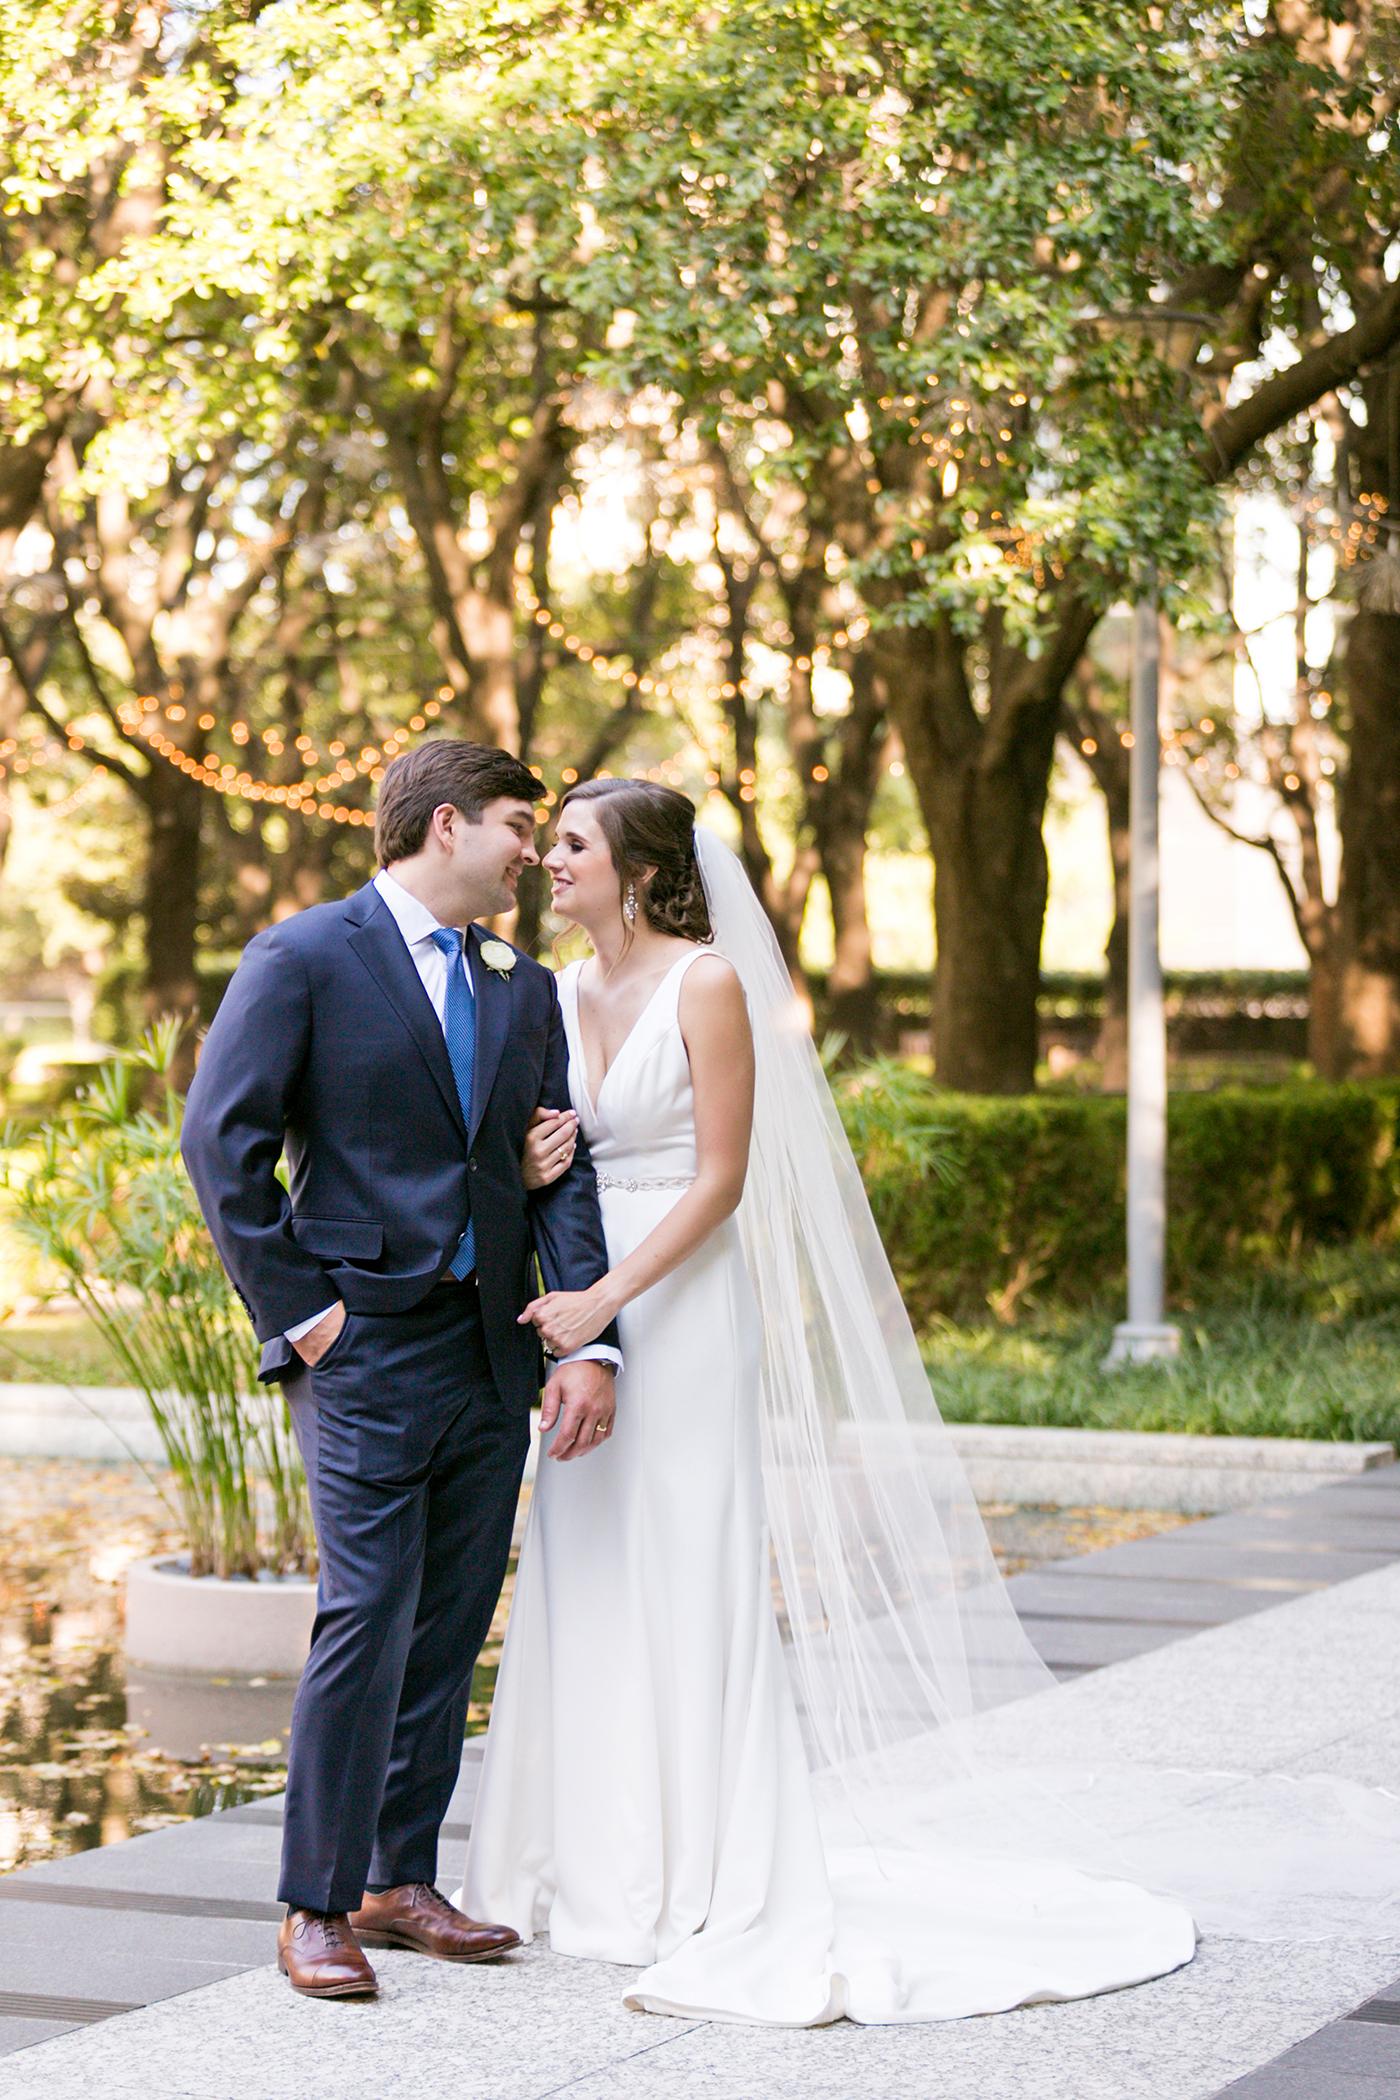 Wedding Planner Dallas TX - Allday Events - Highland Park - Marie Gabrielle Wedding - 271.jpg